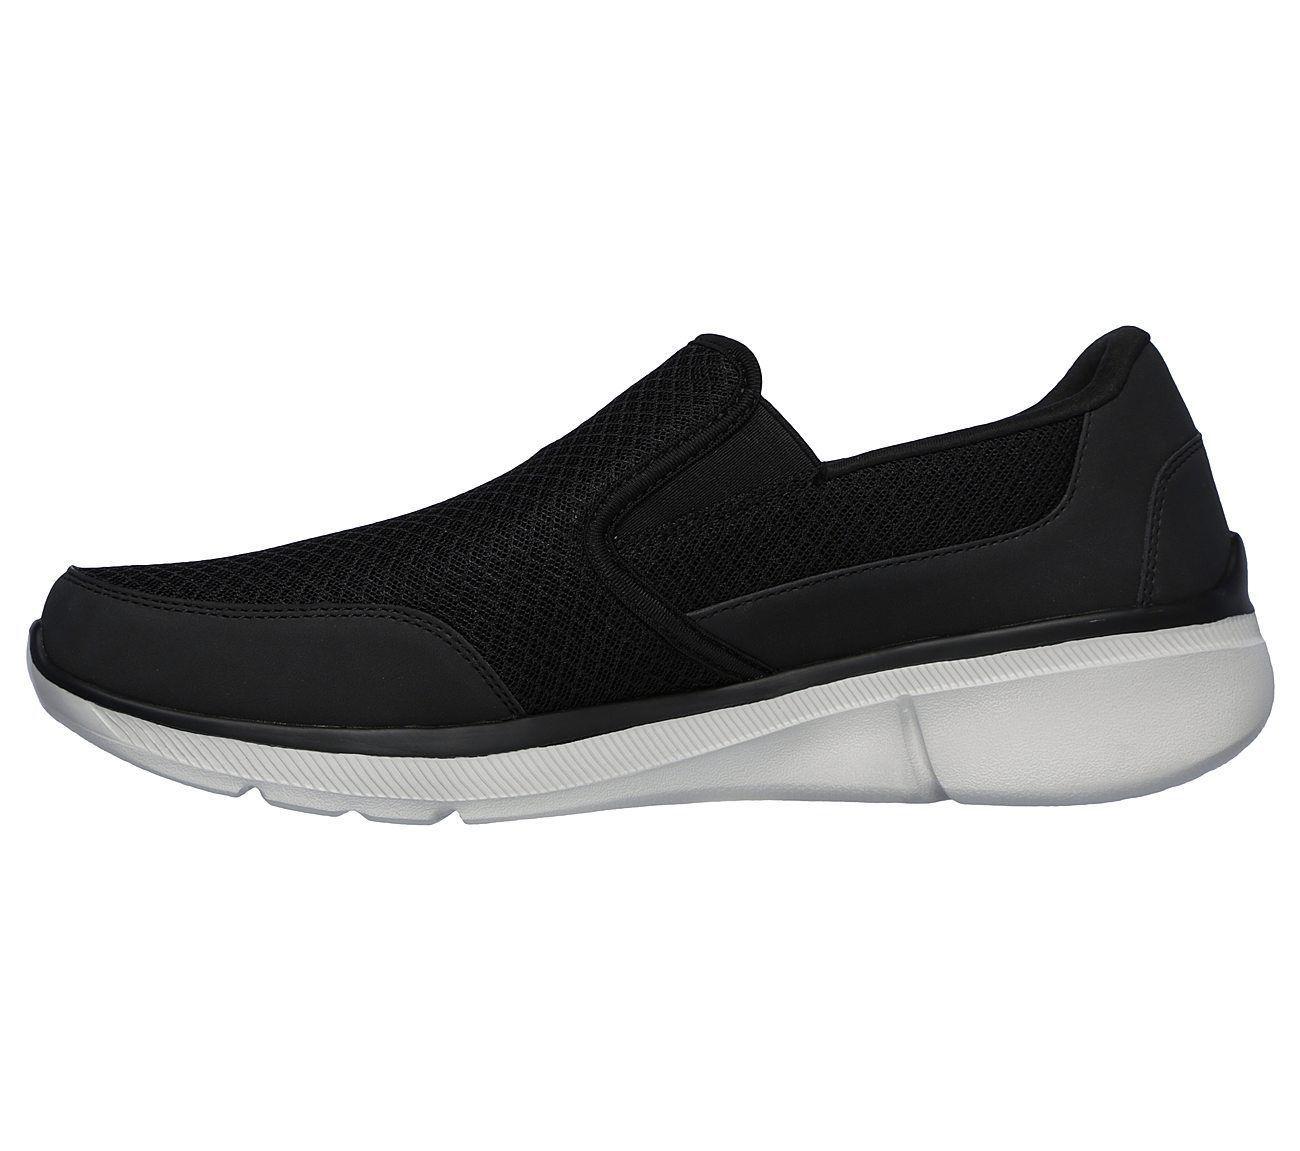 Skechers shoe Men Slip On Extra Wide Black Memory Foam Comfort Casual Soft 52984